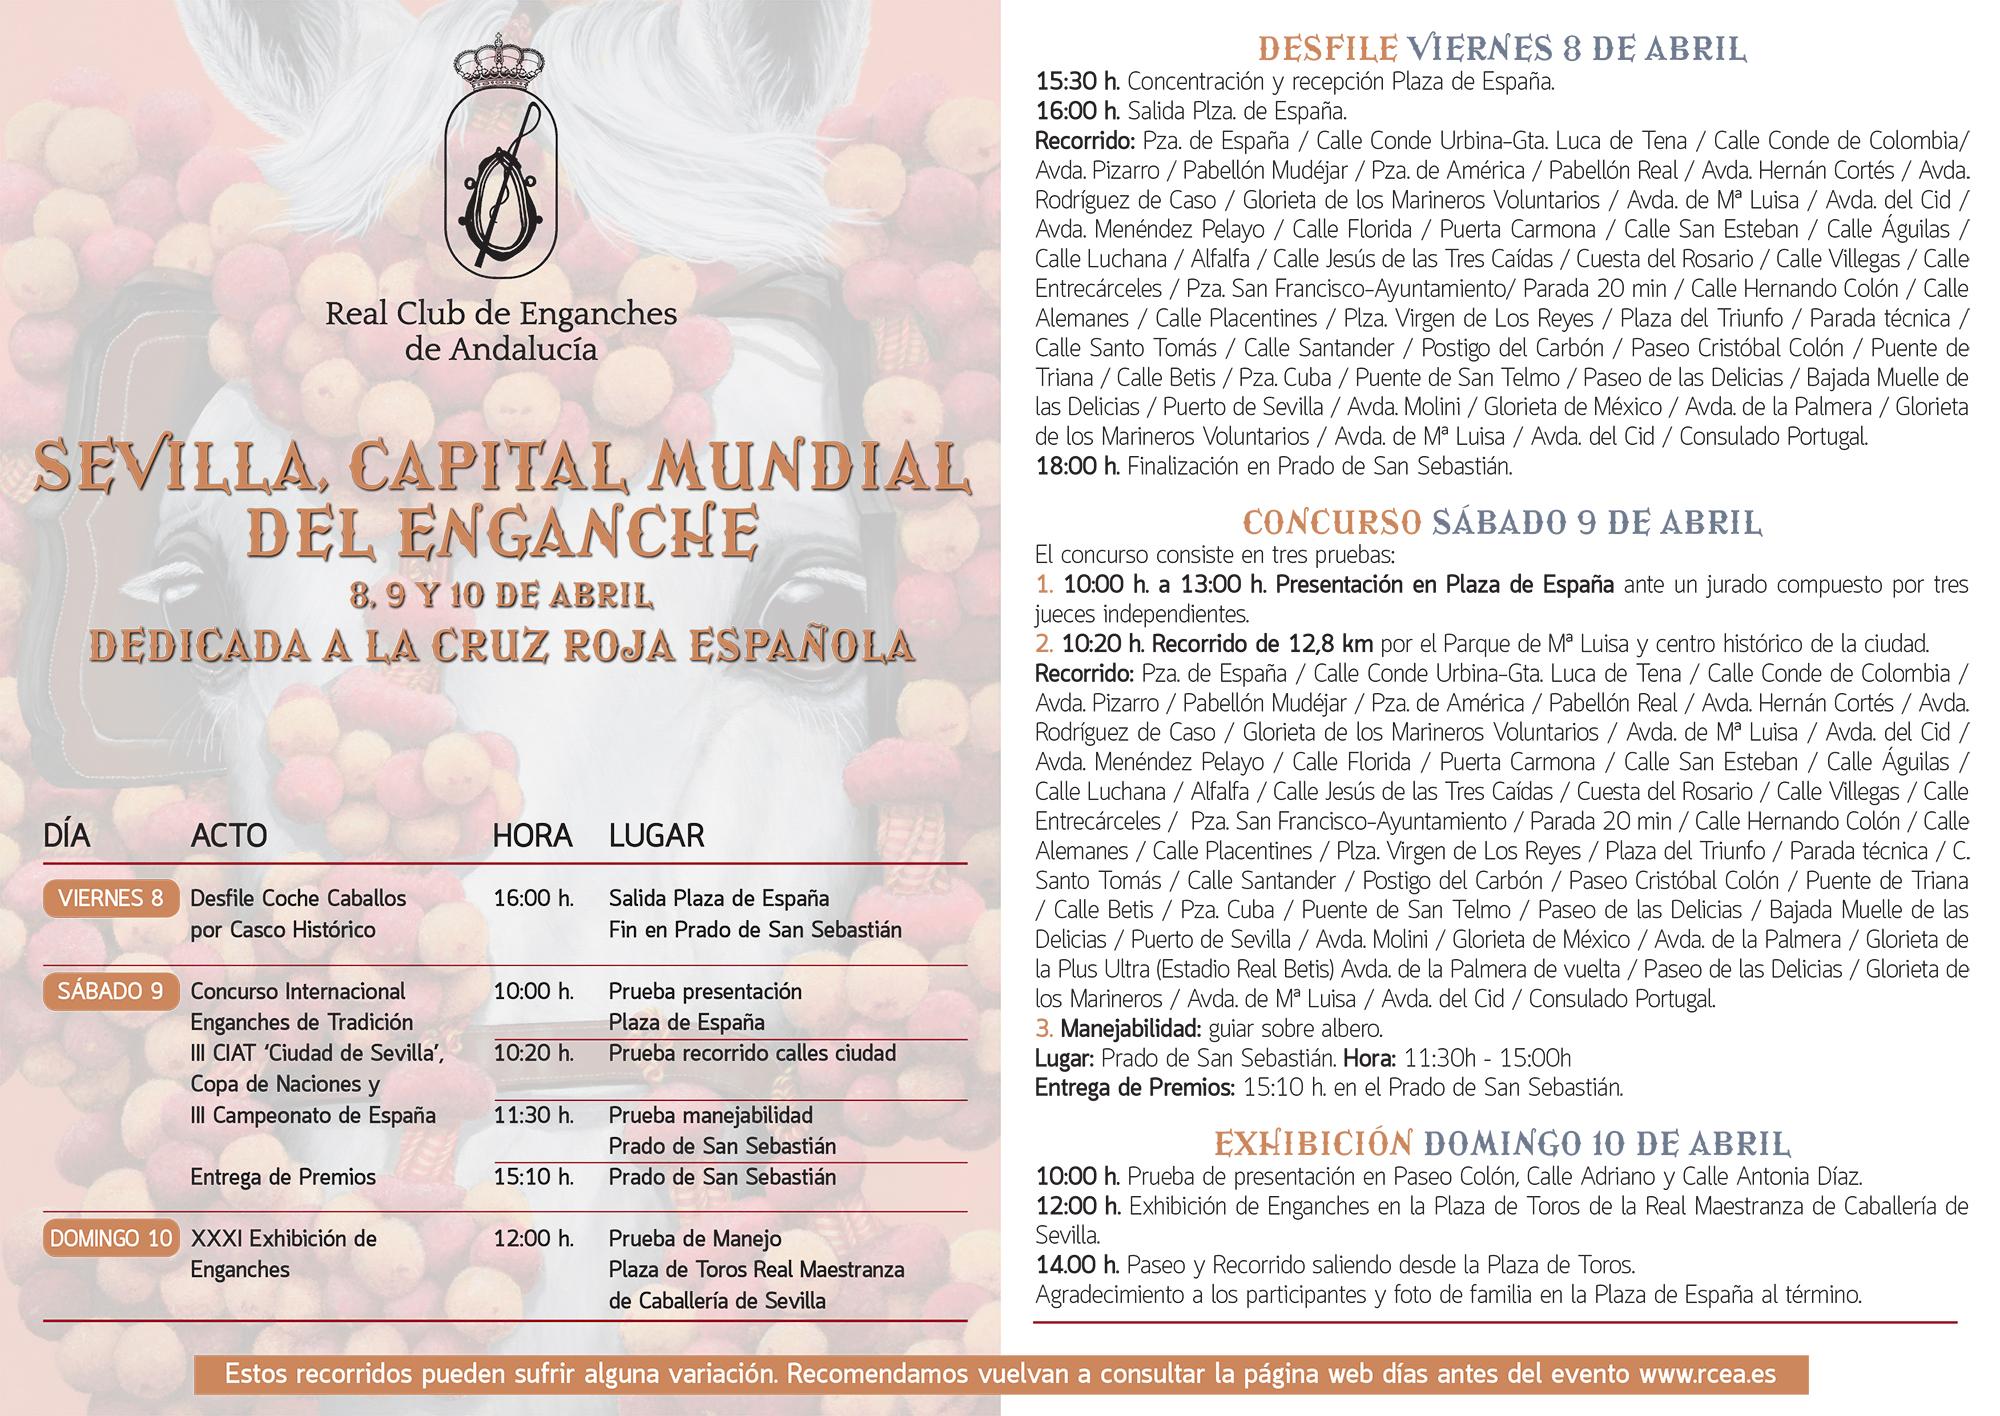 Programa Sevilla Capital Mundial del Enganche 2016